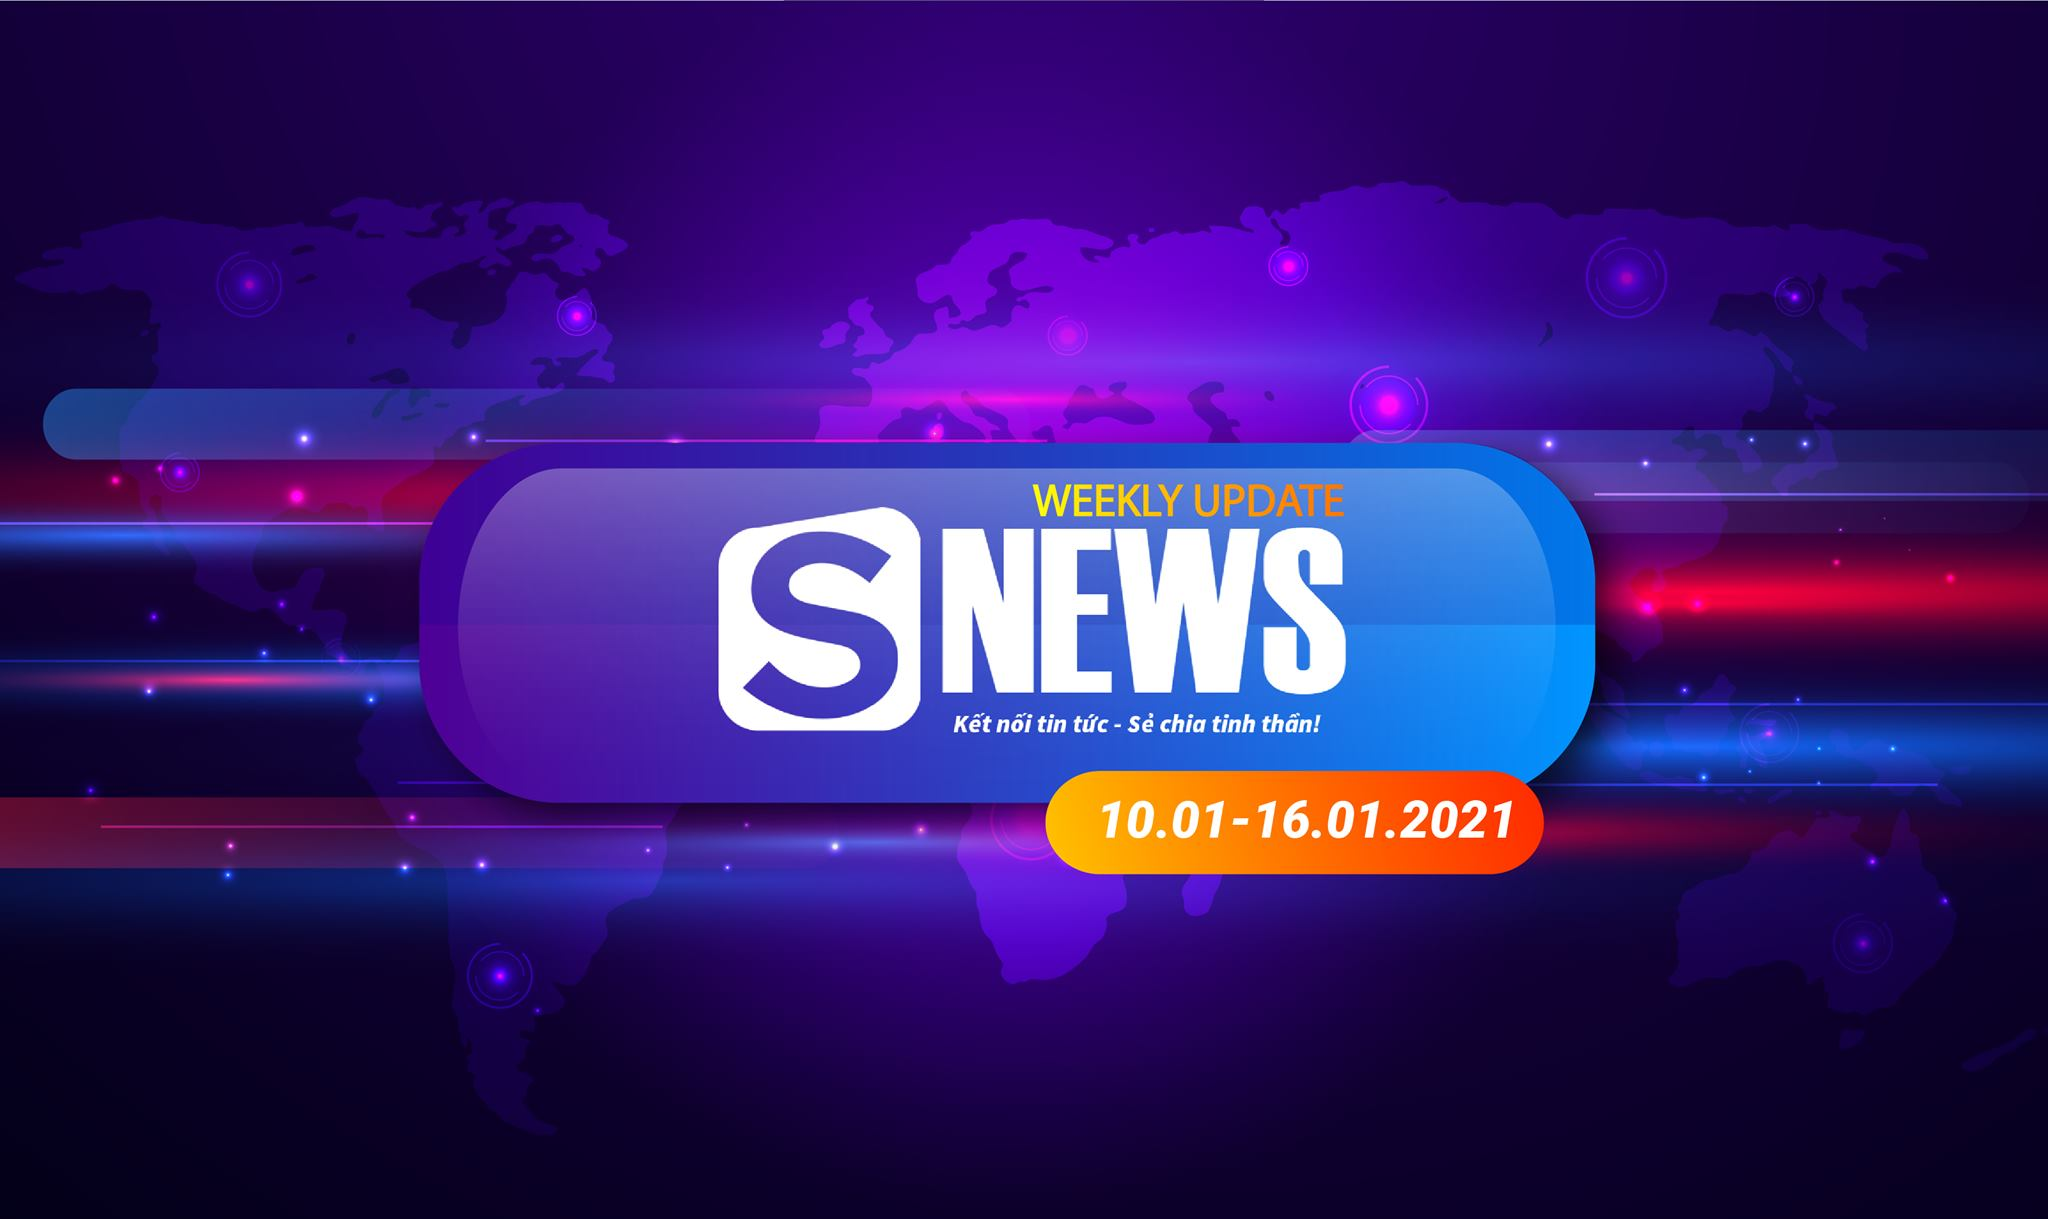 Tổng hợp tin tức Sapo tuần qua: 10.01 - 16.01.2020